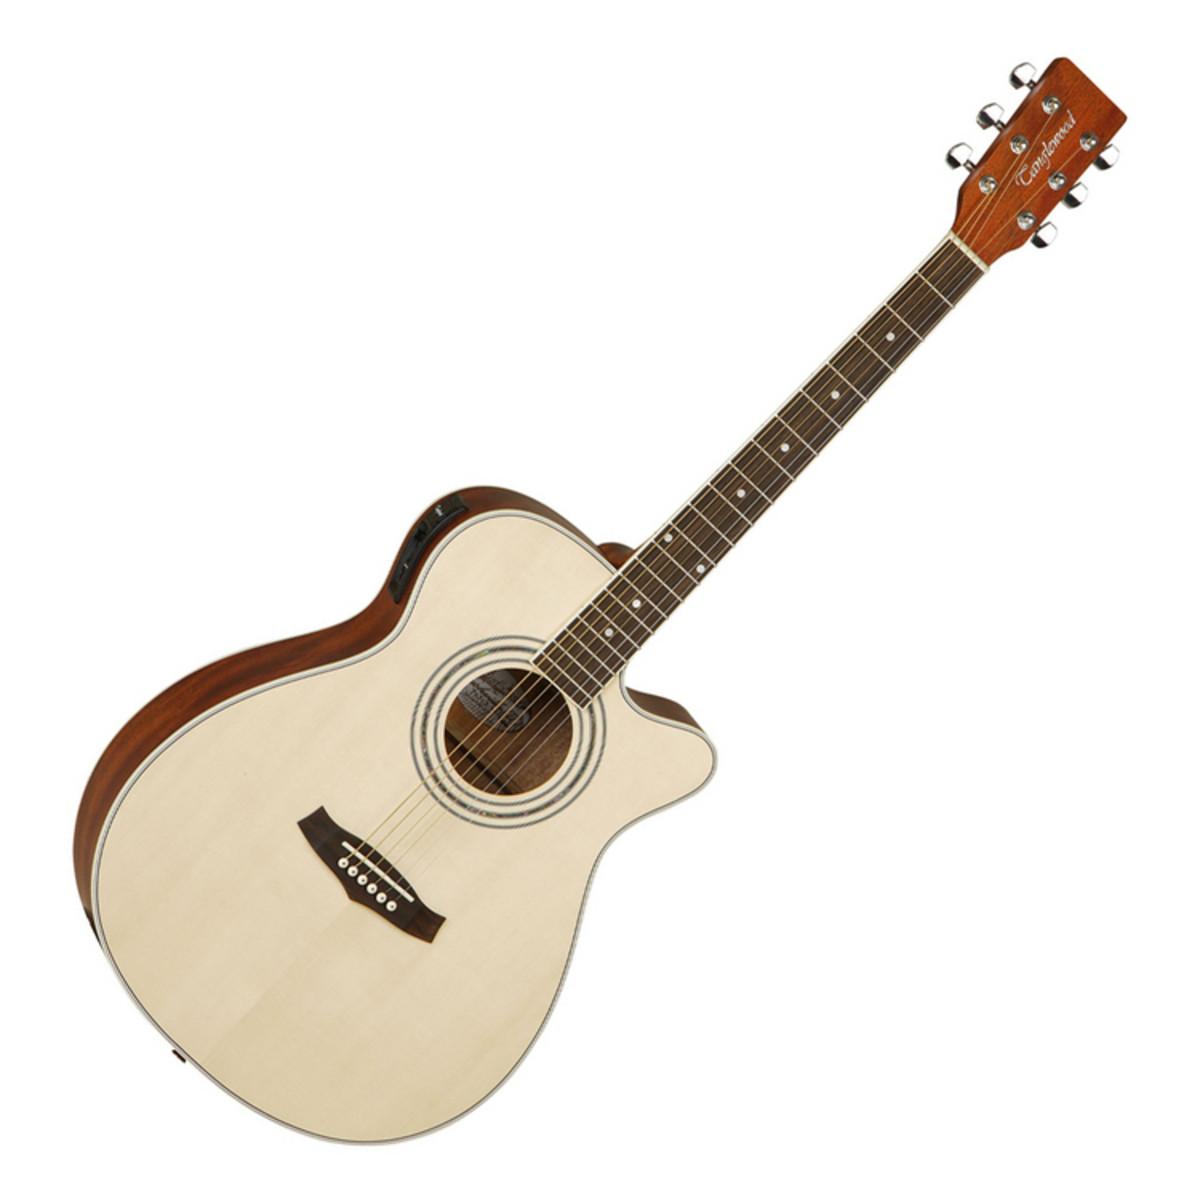 tanglewood tsf8 nashville iii electro acoustic guitar at. Black Bedroom Furniture Sets. Home Design Ideas